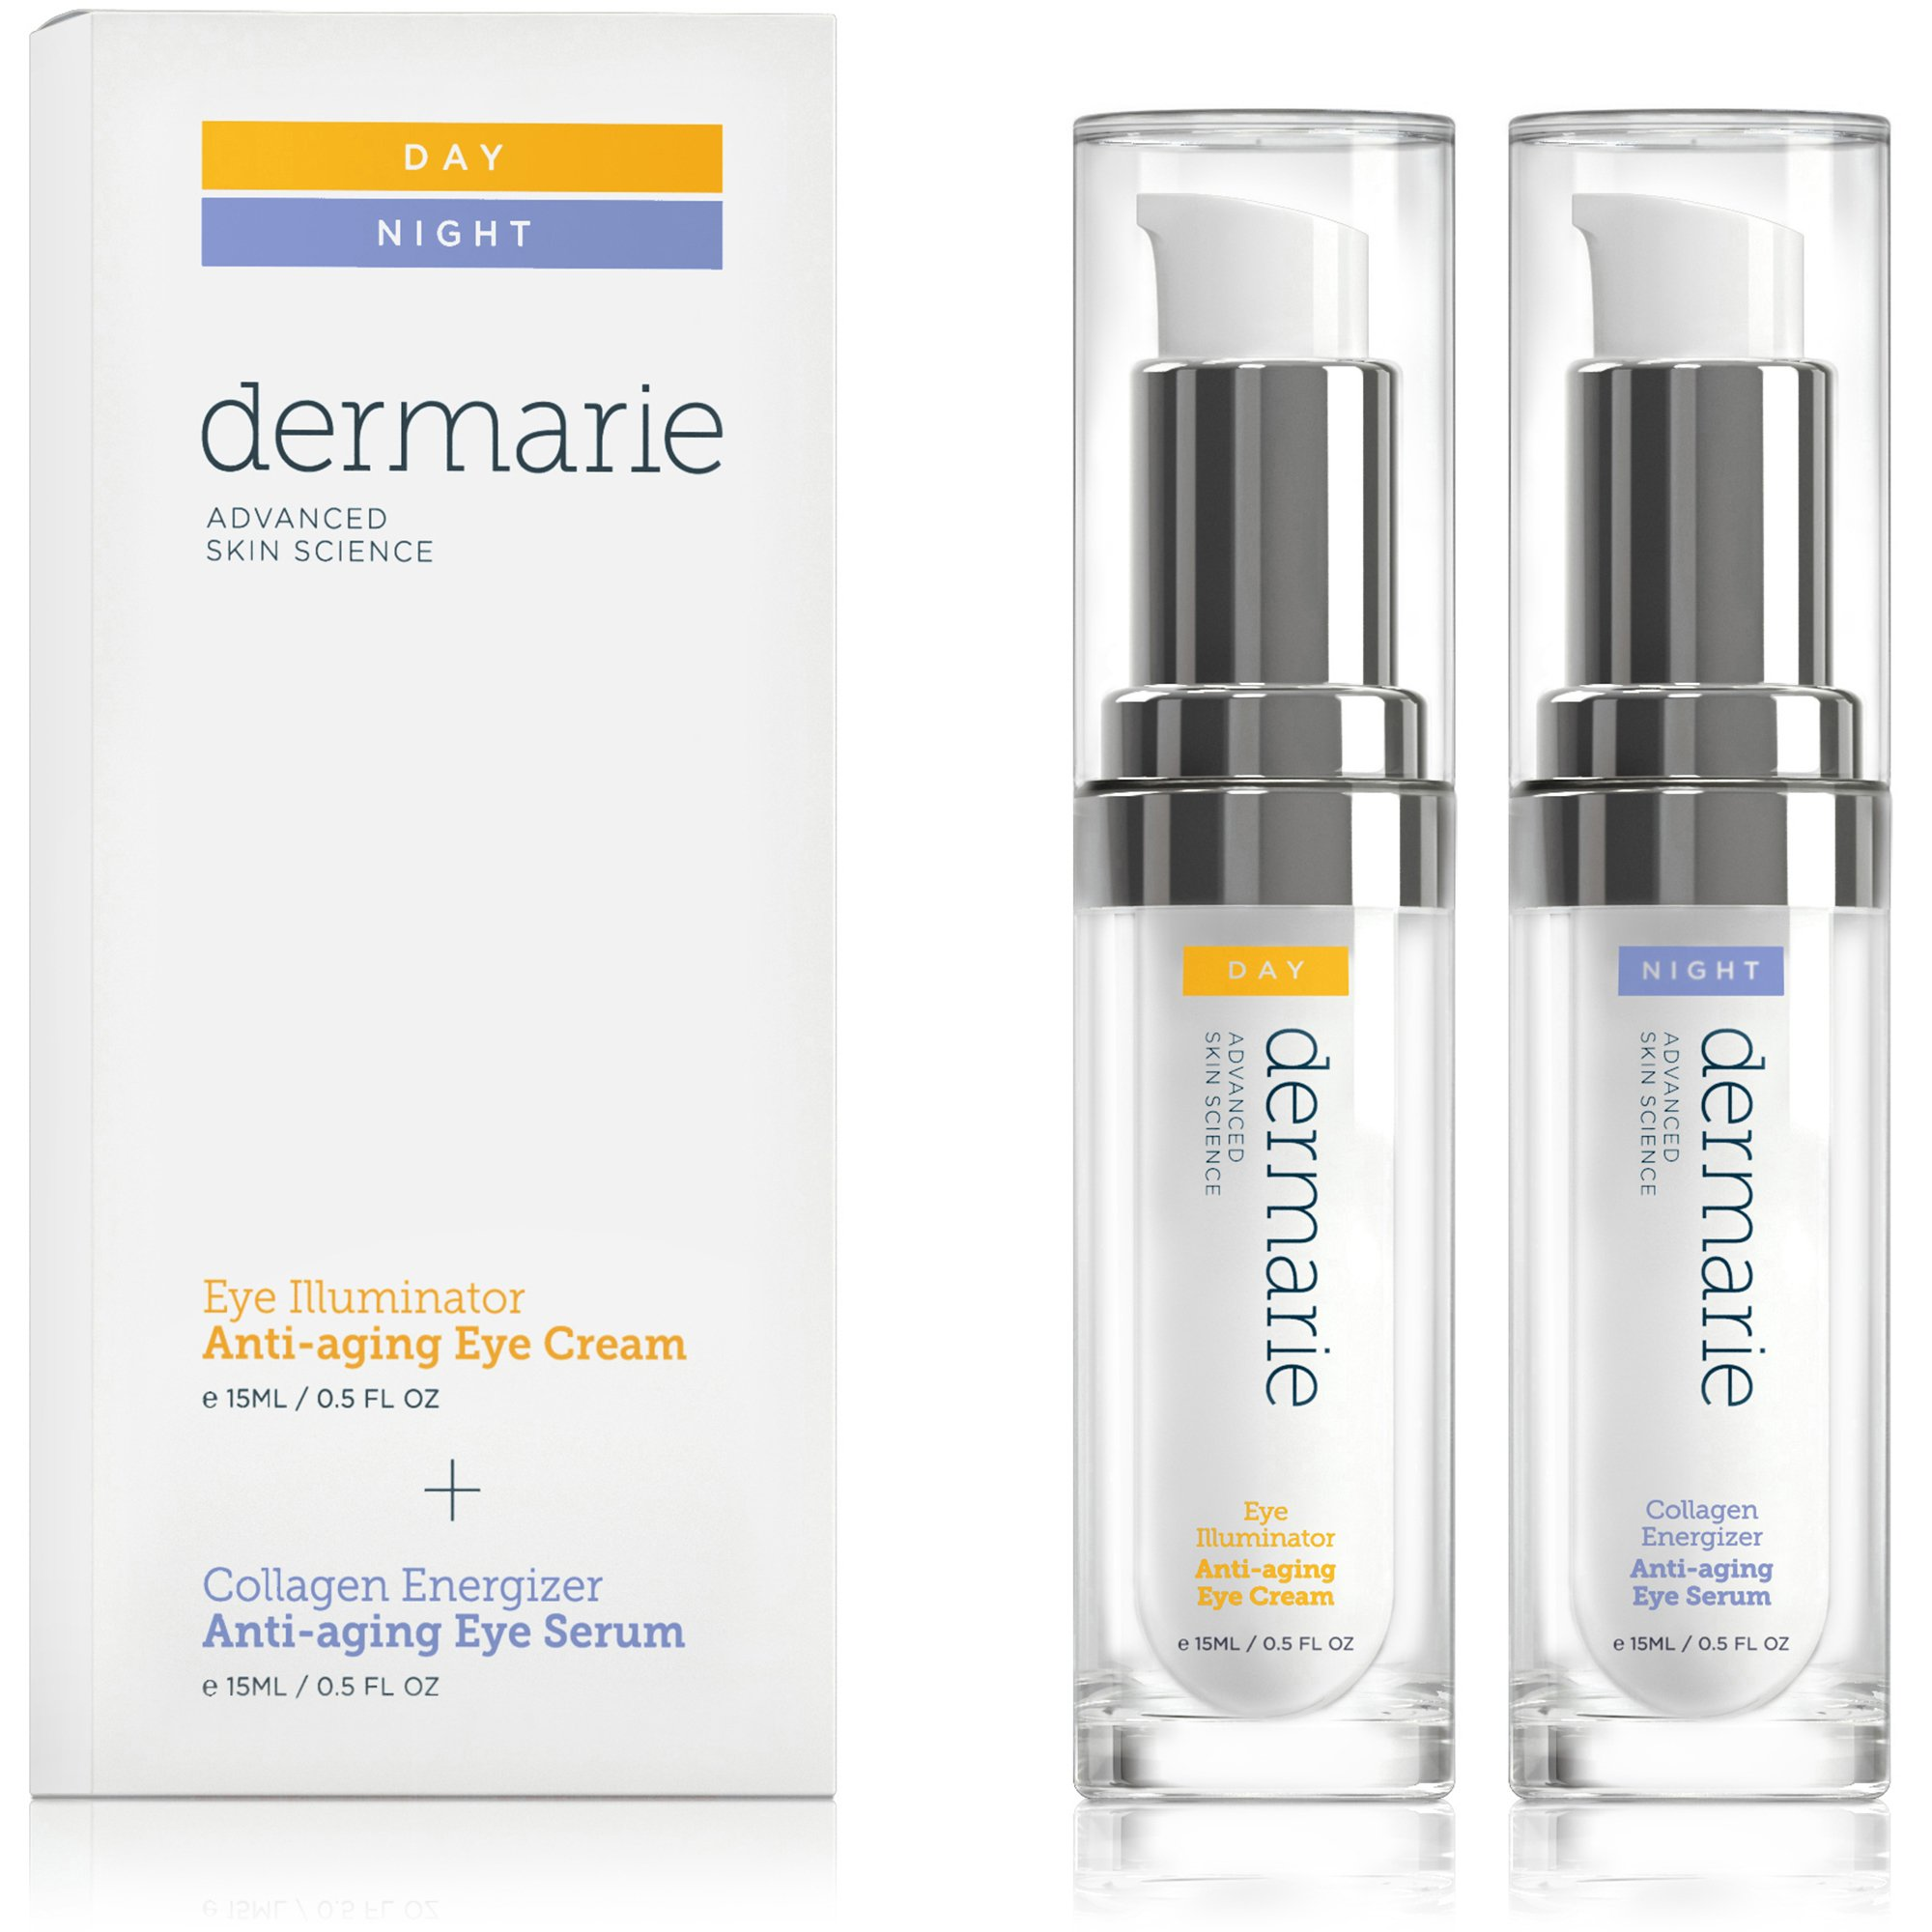 Dermarie Illuminator Eye Cream & Collagen Energizer Eye Serum Anti-aging Treatment Set, 0.5 oz. / 15 g